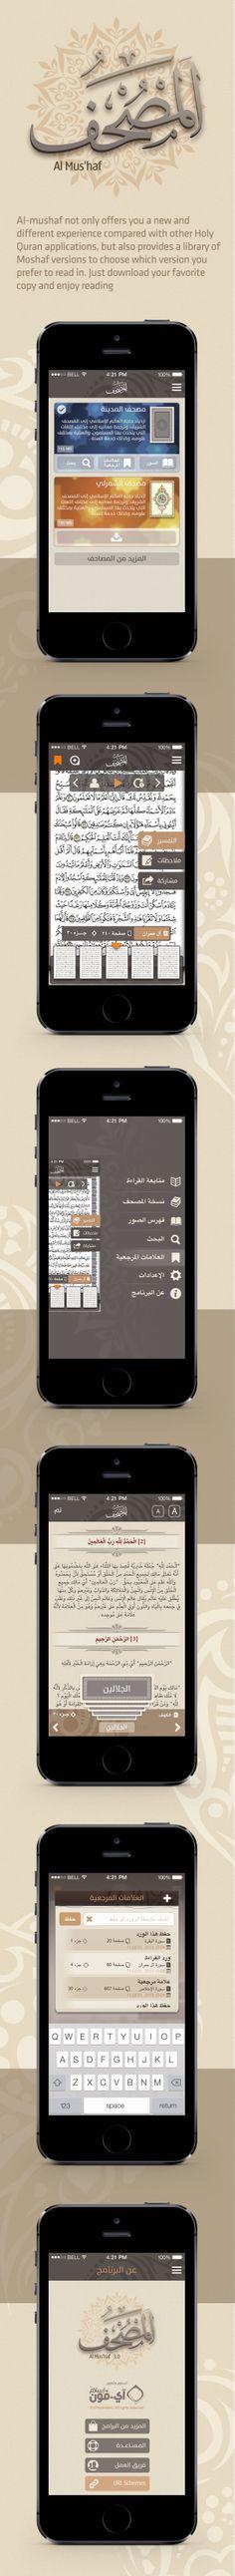 Al Mus'haf App by Ayman El Badry, via Behance